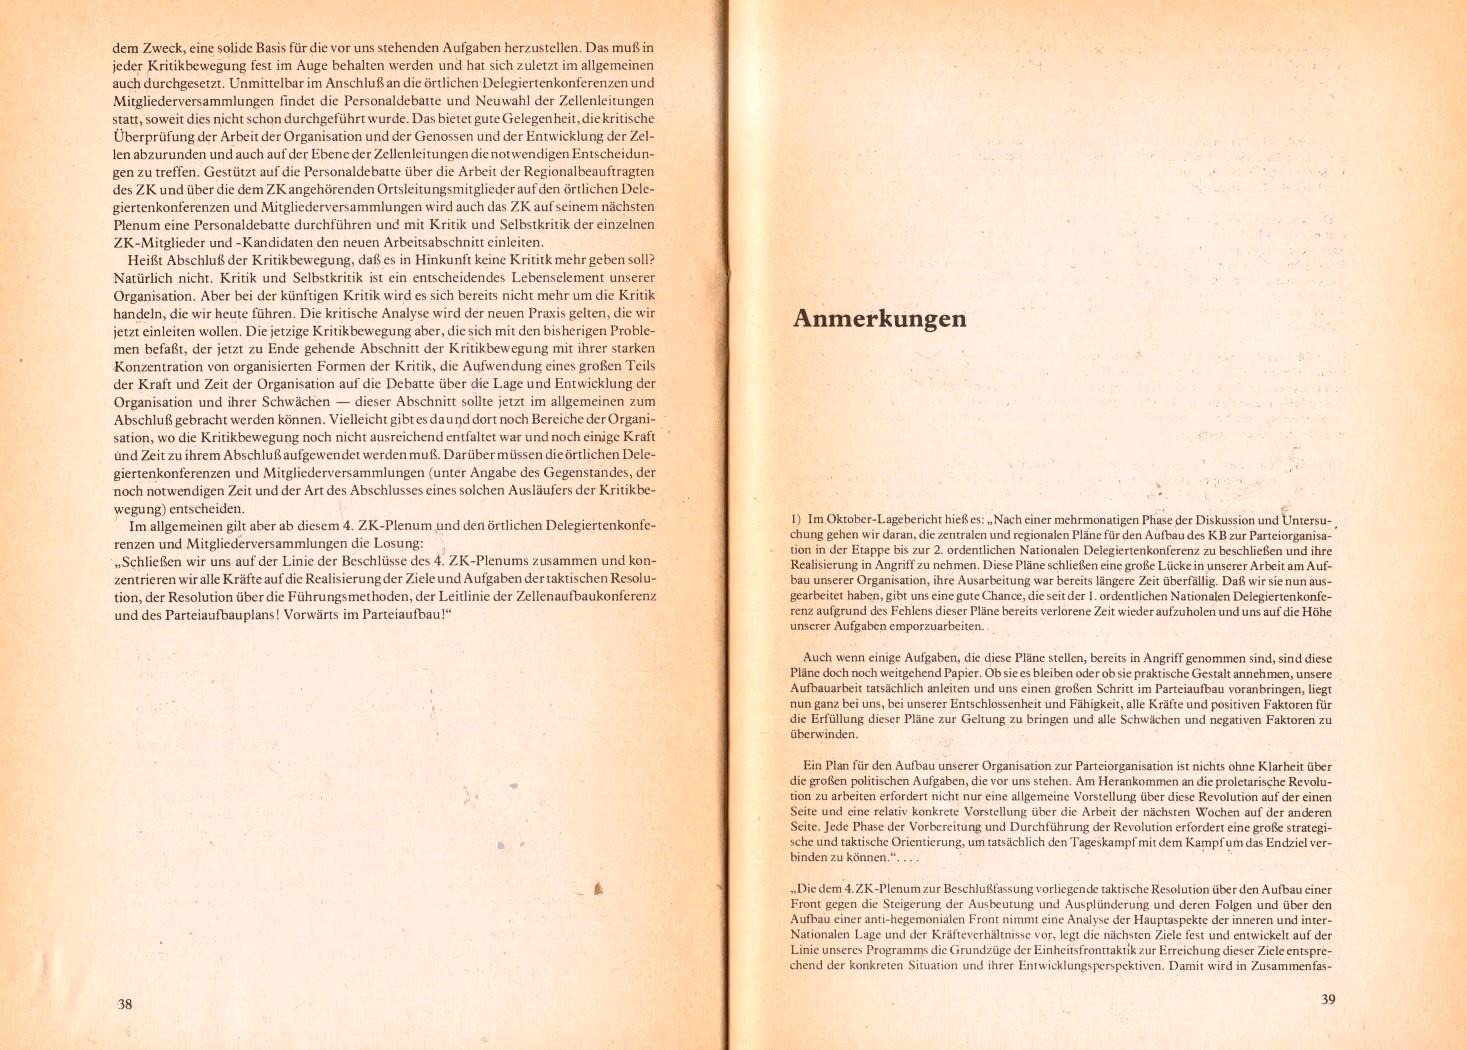 KBOe_1979_Doku_ZK_Plenum_04_21